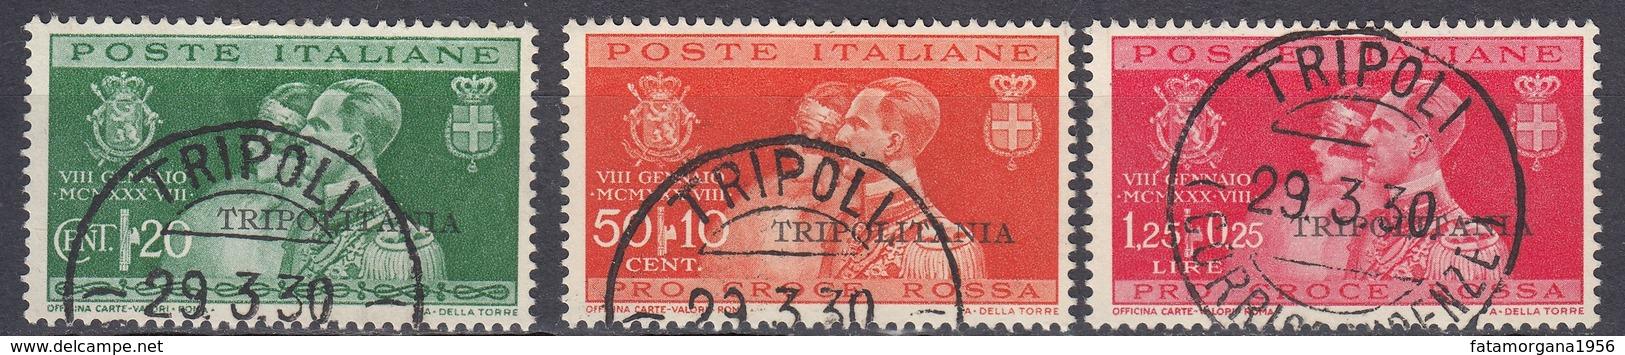 TRIPOLITANIA (colonia Italiana) - 1930 -  Serie Completa Usata: Yvert 84/86. - Tripolitania